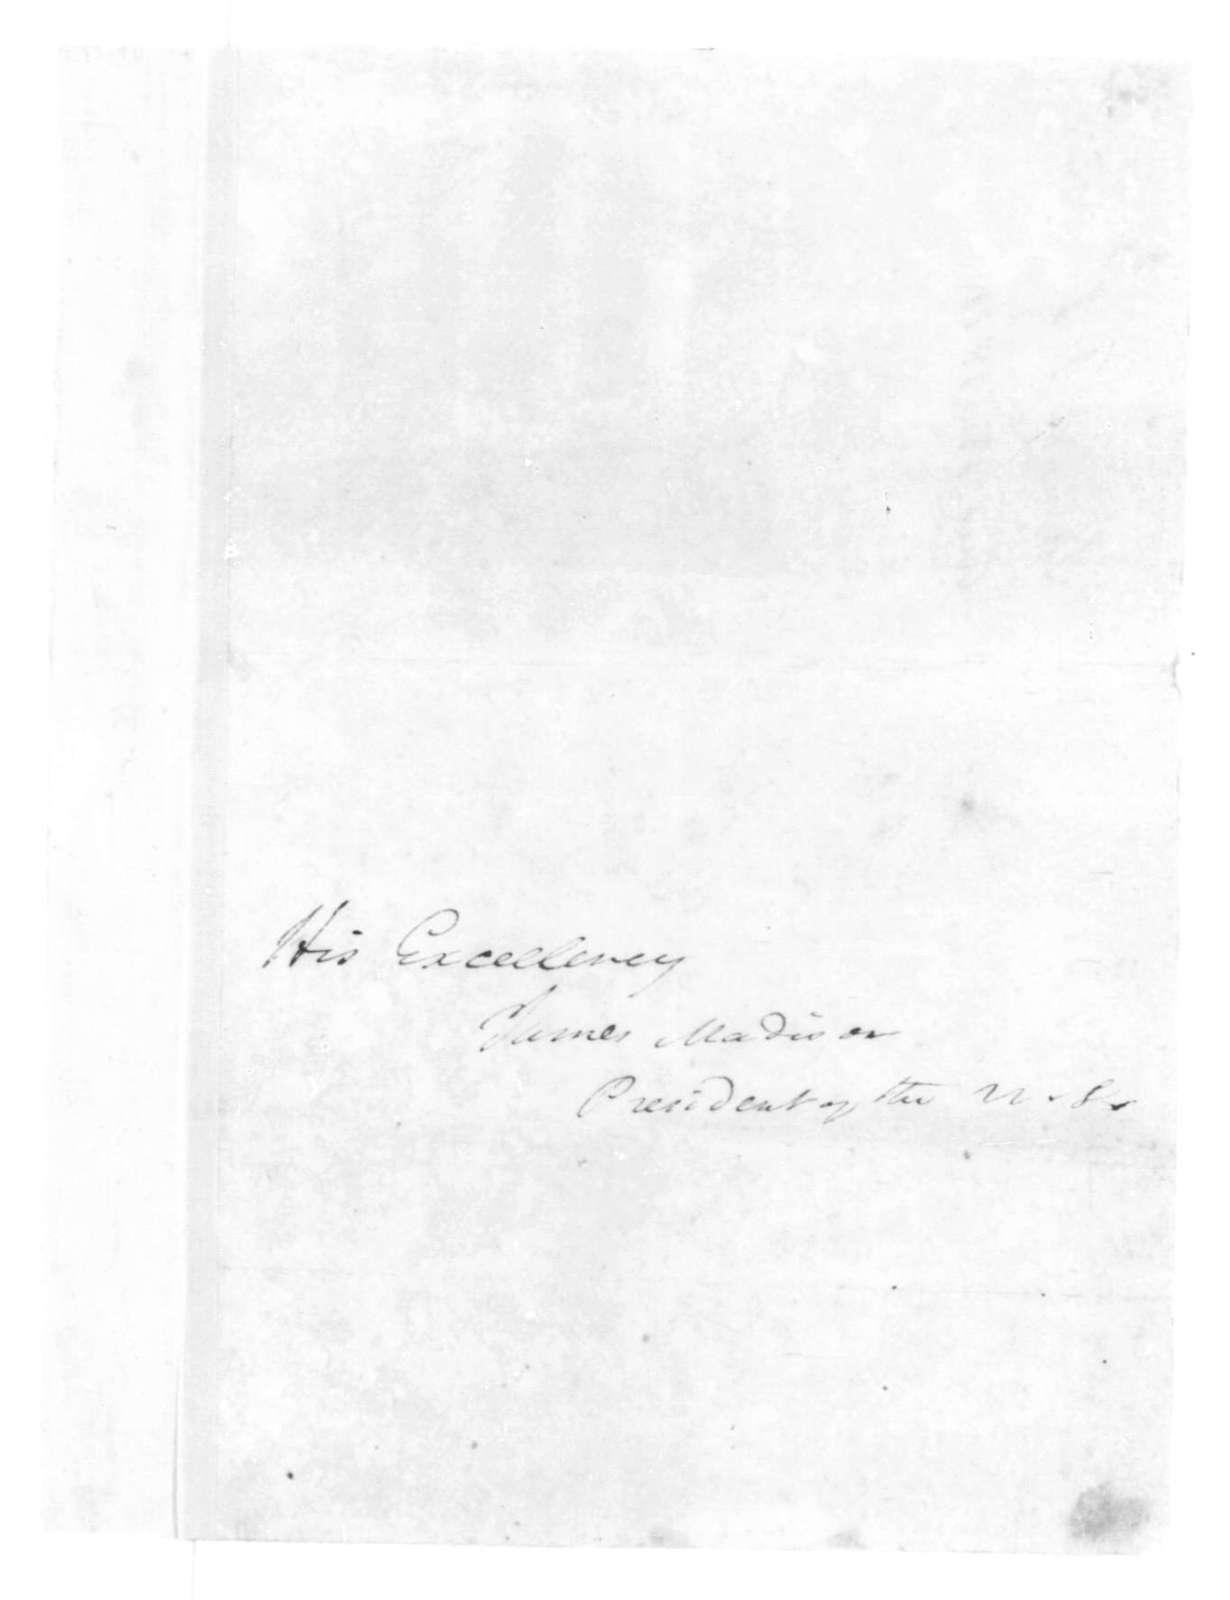 J. S. Skinner to James Madison, August 13, 1814.